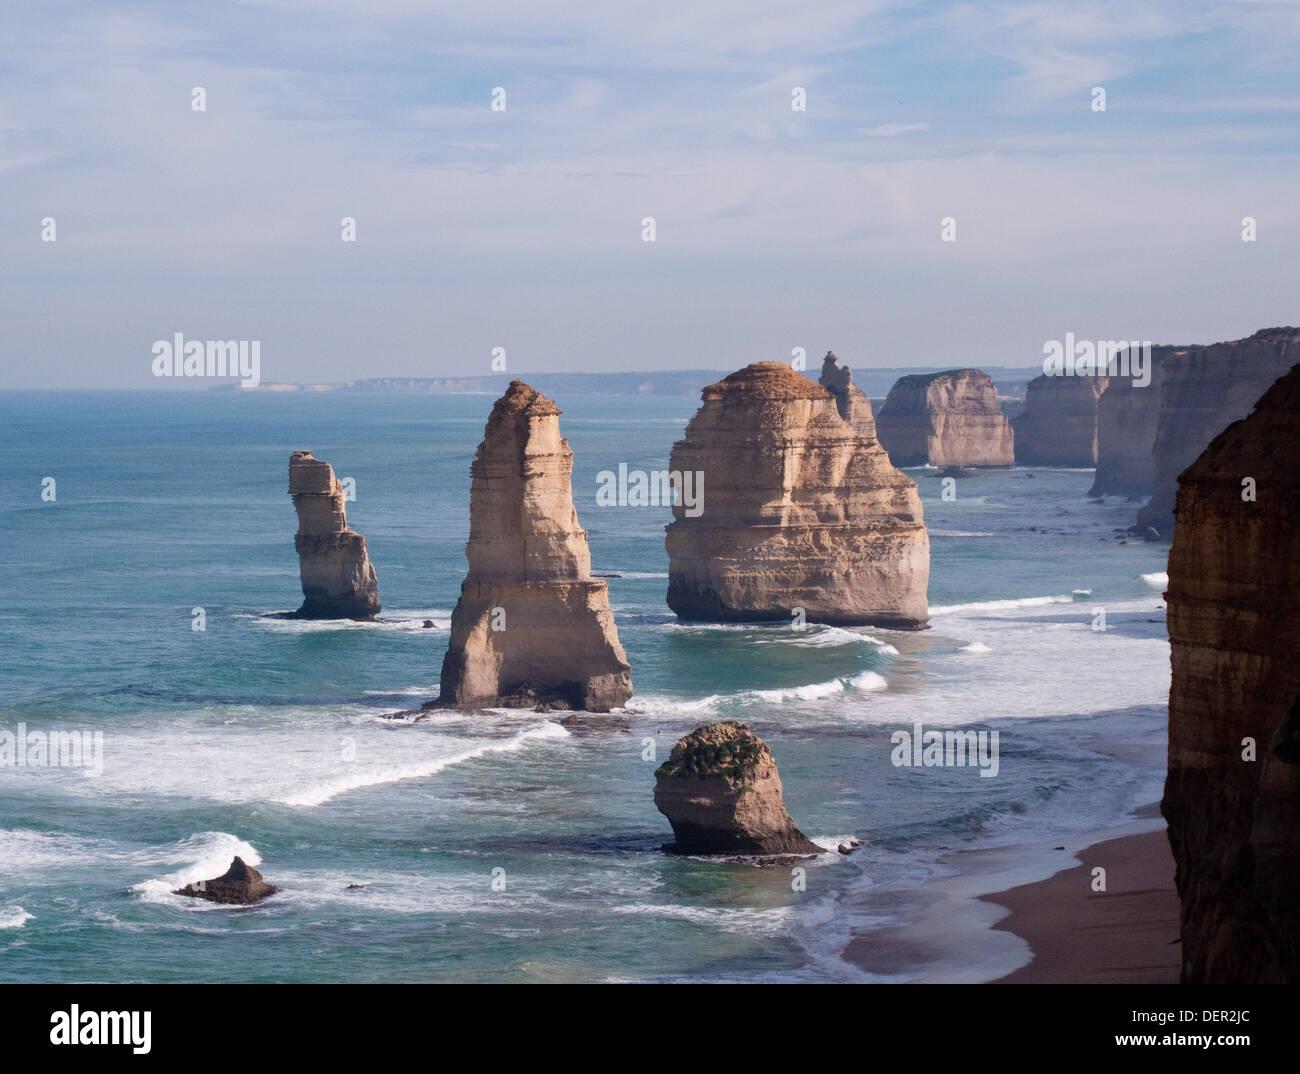 The Twelve Apostles, limestone stacks off the coast of Port Campbell National Park, Victoria, Australia - Stock Image